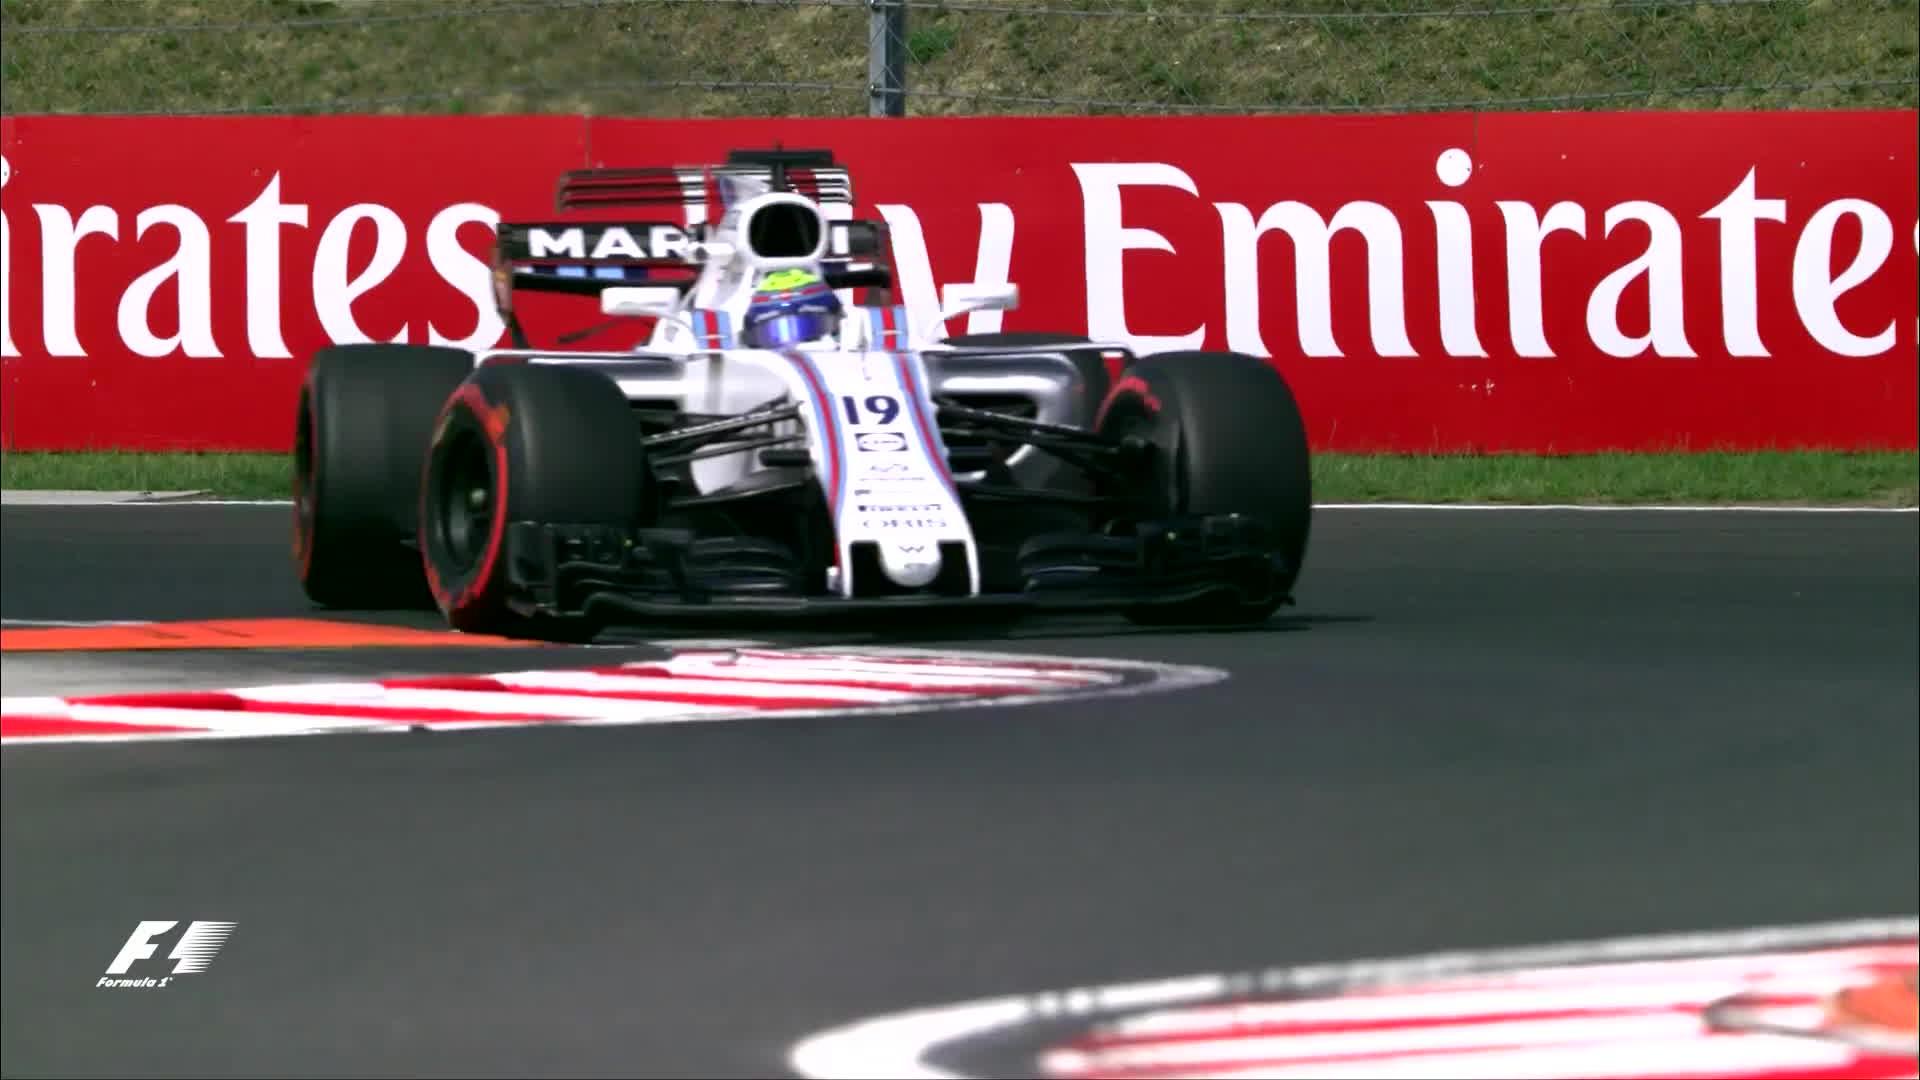 f1, formula 1, formula one, 2017 Hungary F1 Massa spins GIFs